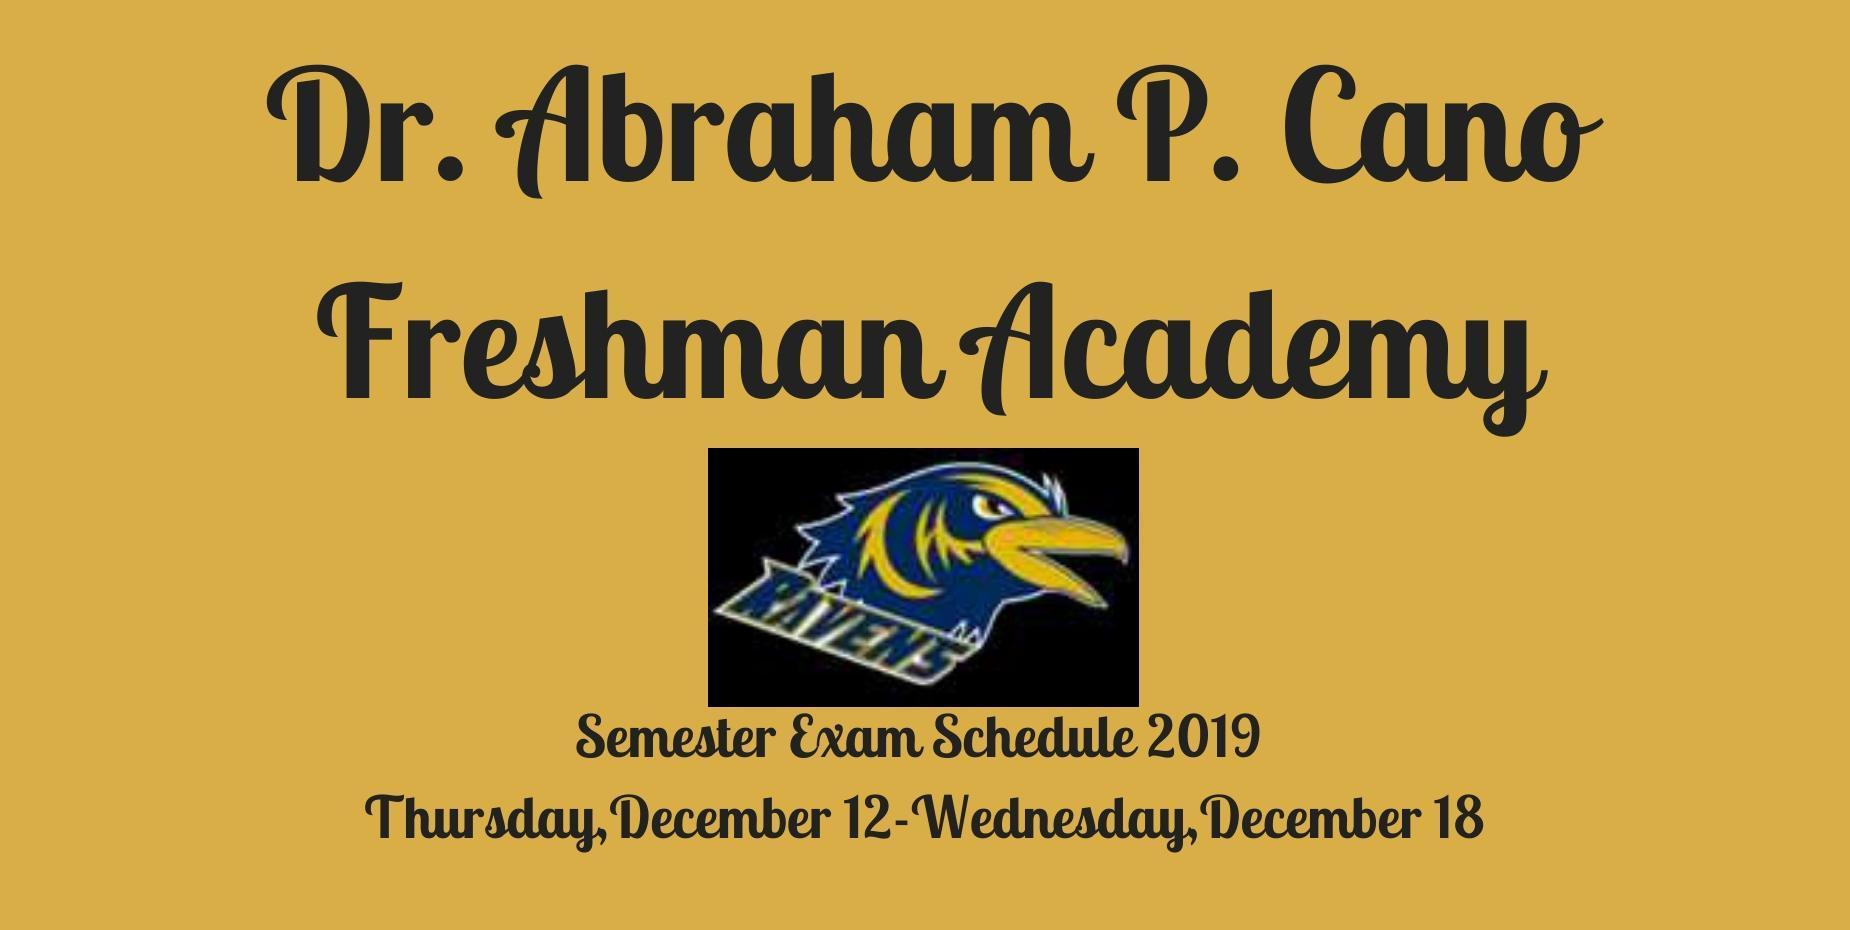 Semester Exam Schedule 2019